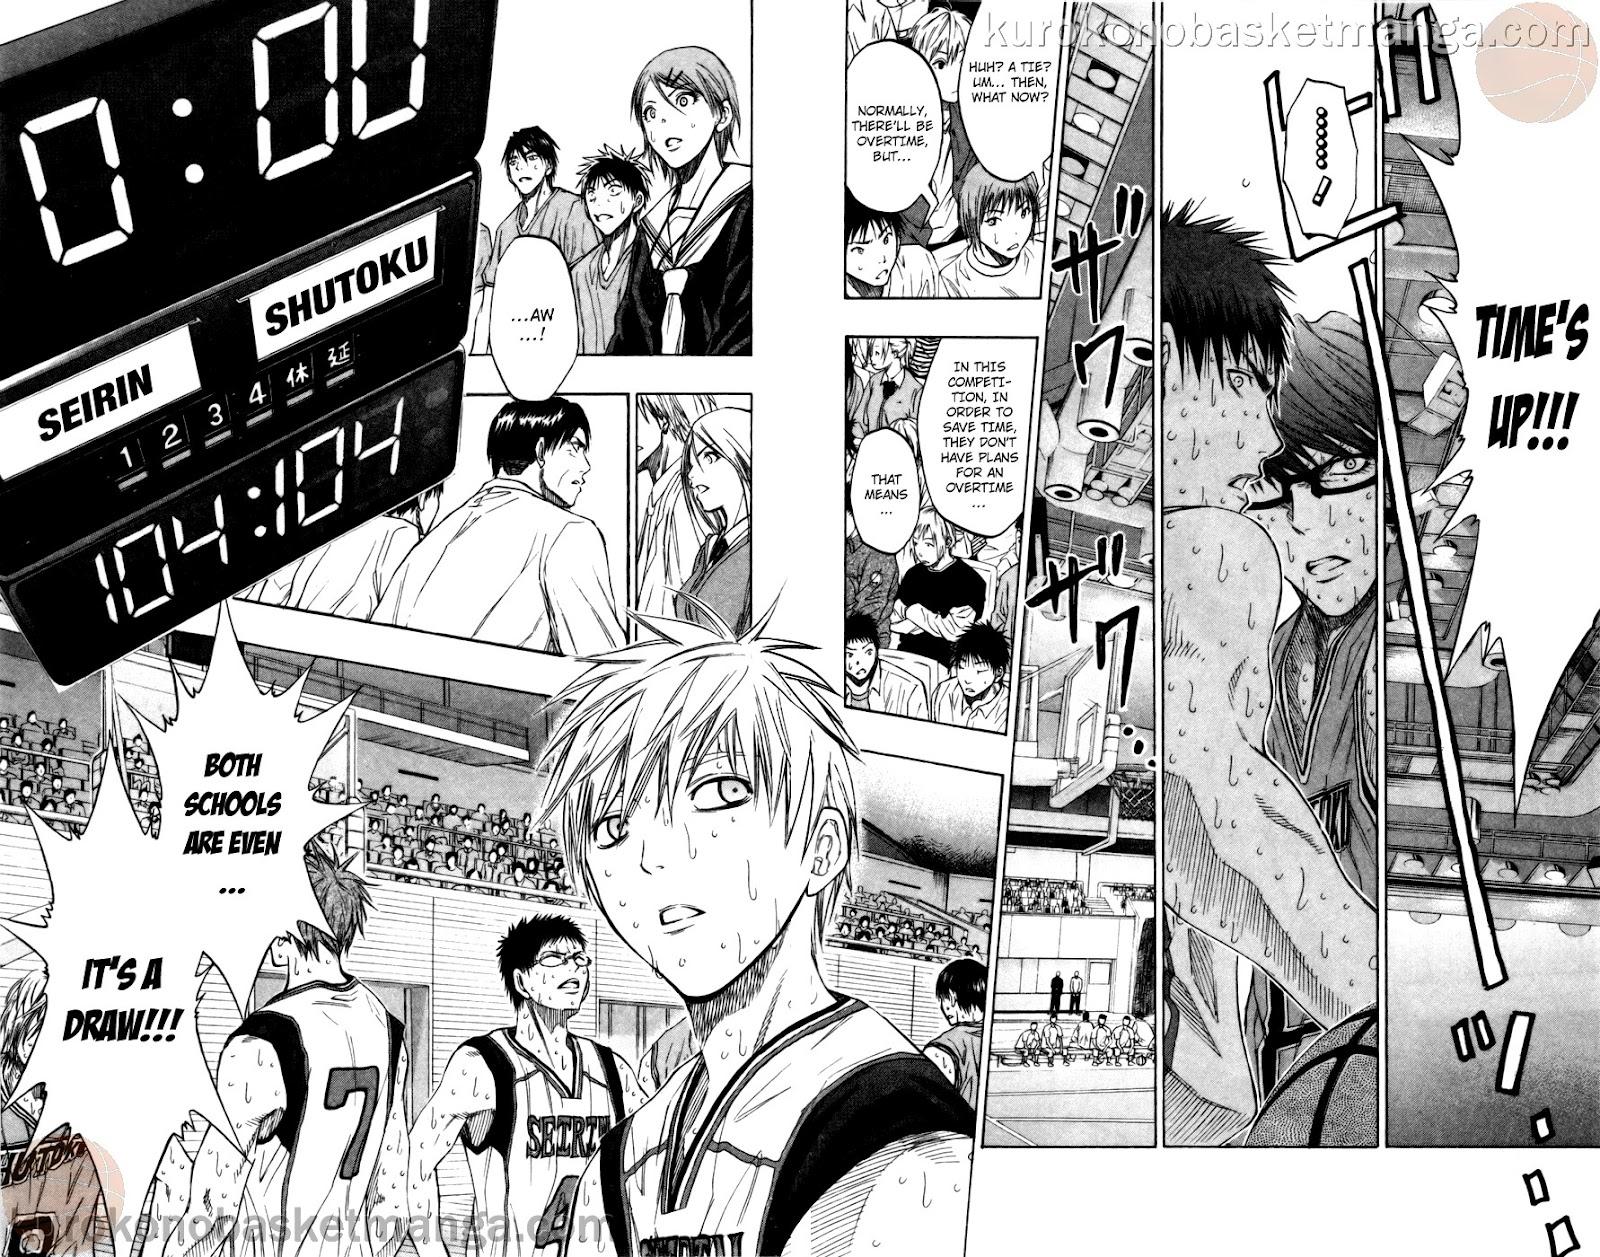 Kuroko no Basket Manga Chapter 92 - Image 18-19